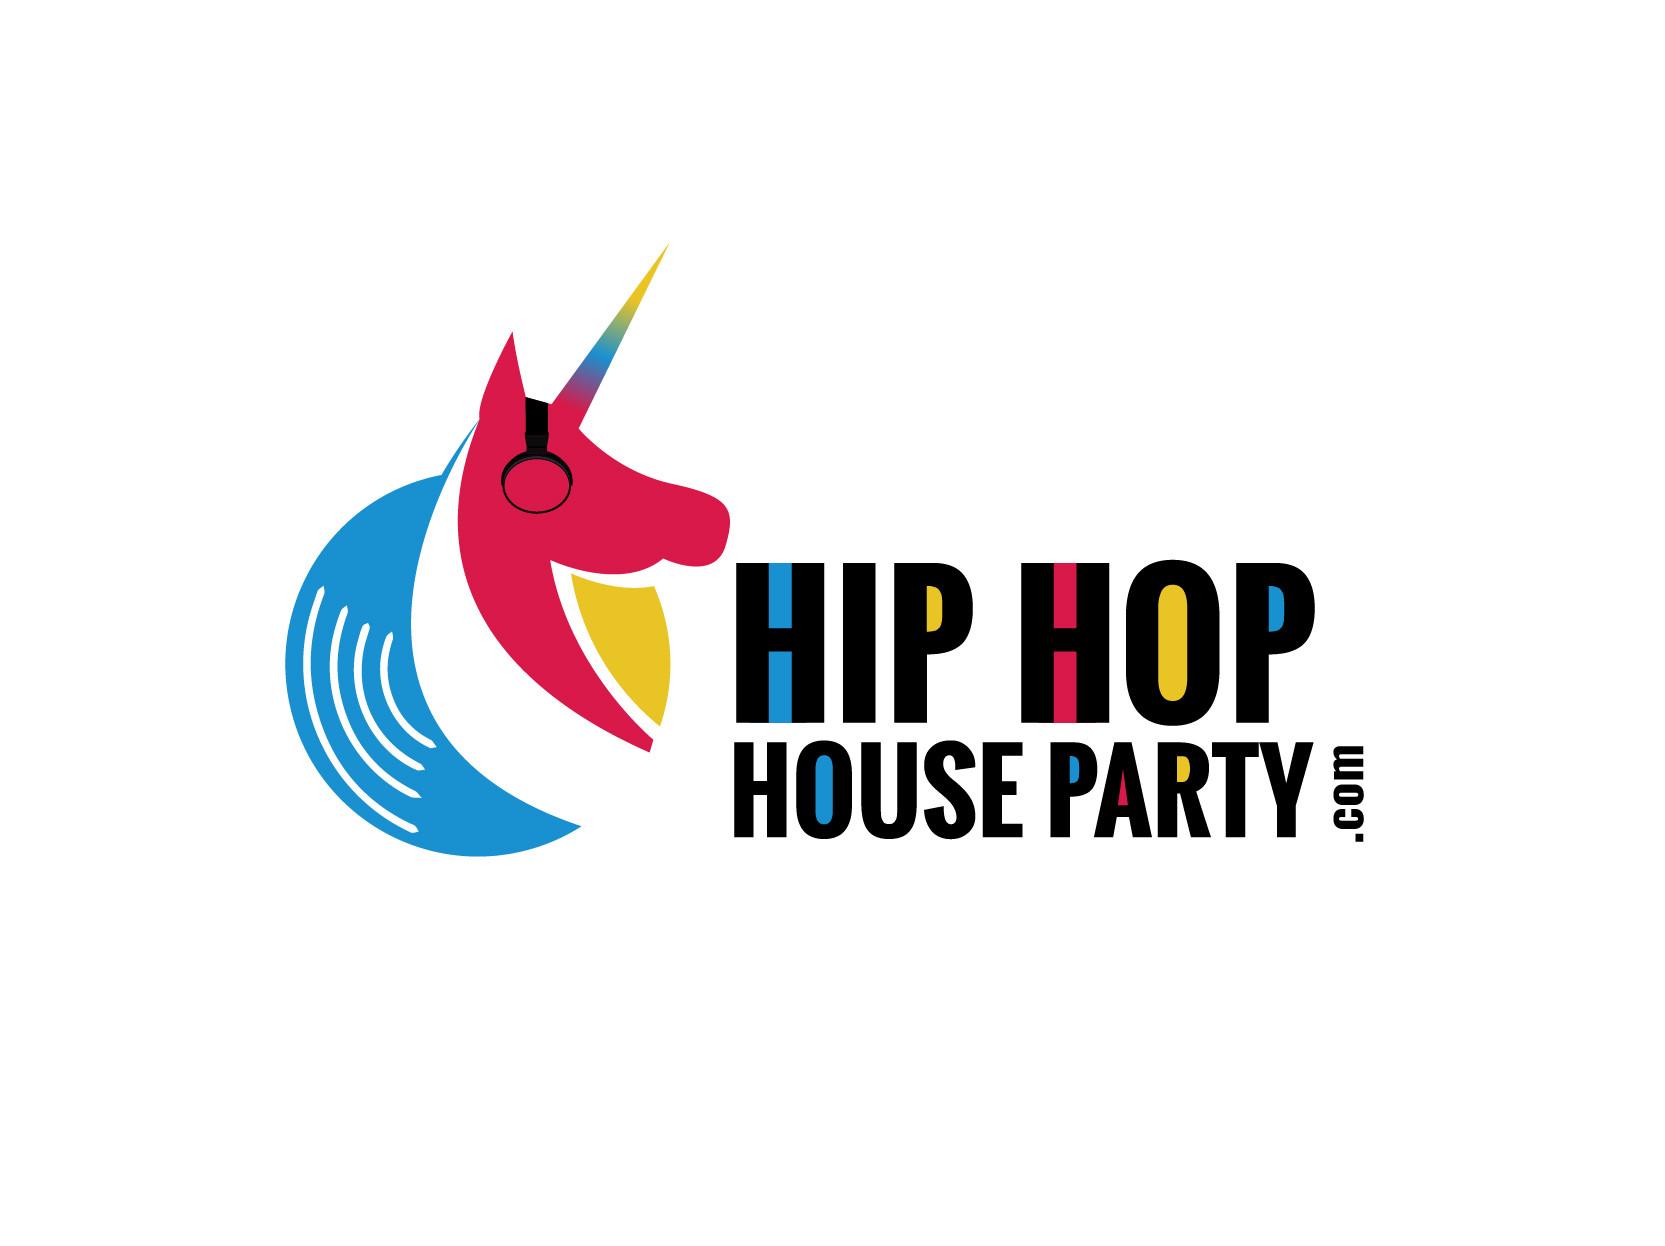 Hip-Hop House Party